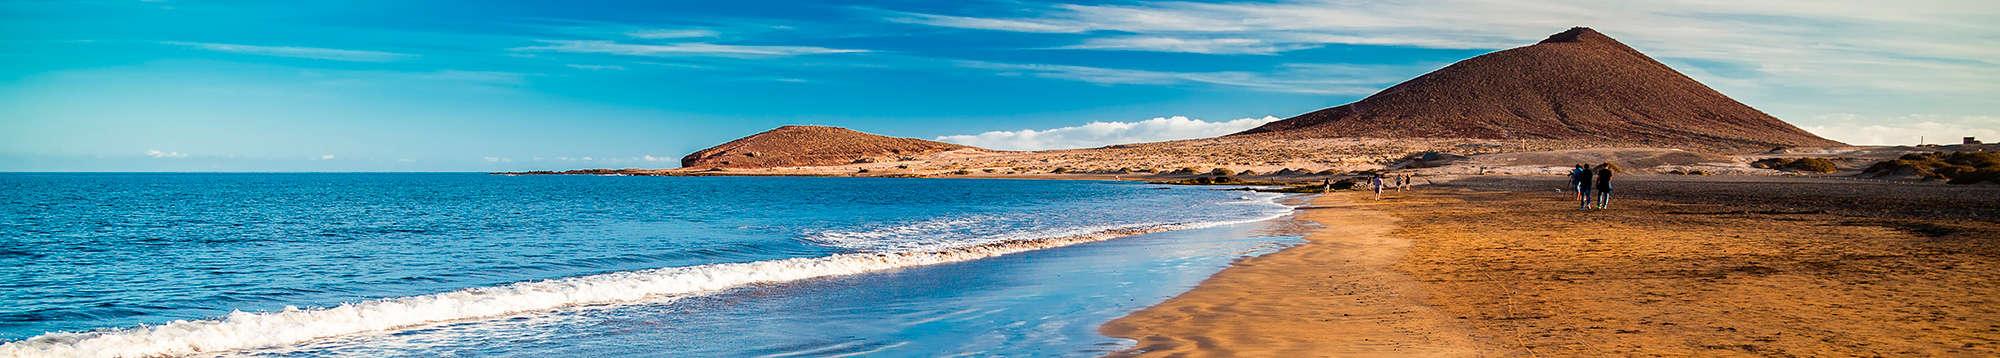 Escapadas fin de semana en Santa Cruz de Tenerife